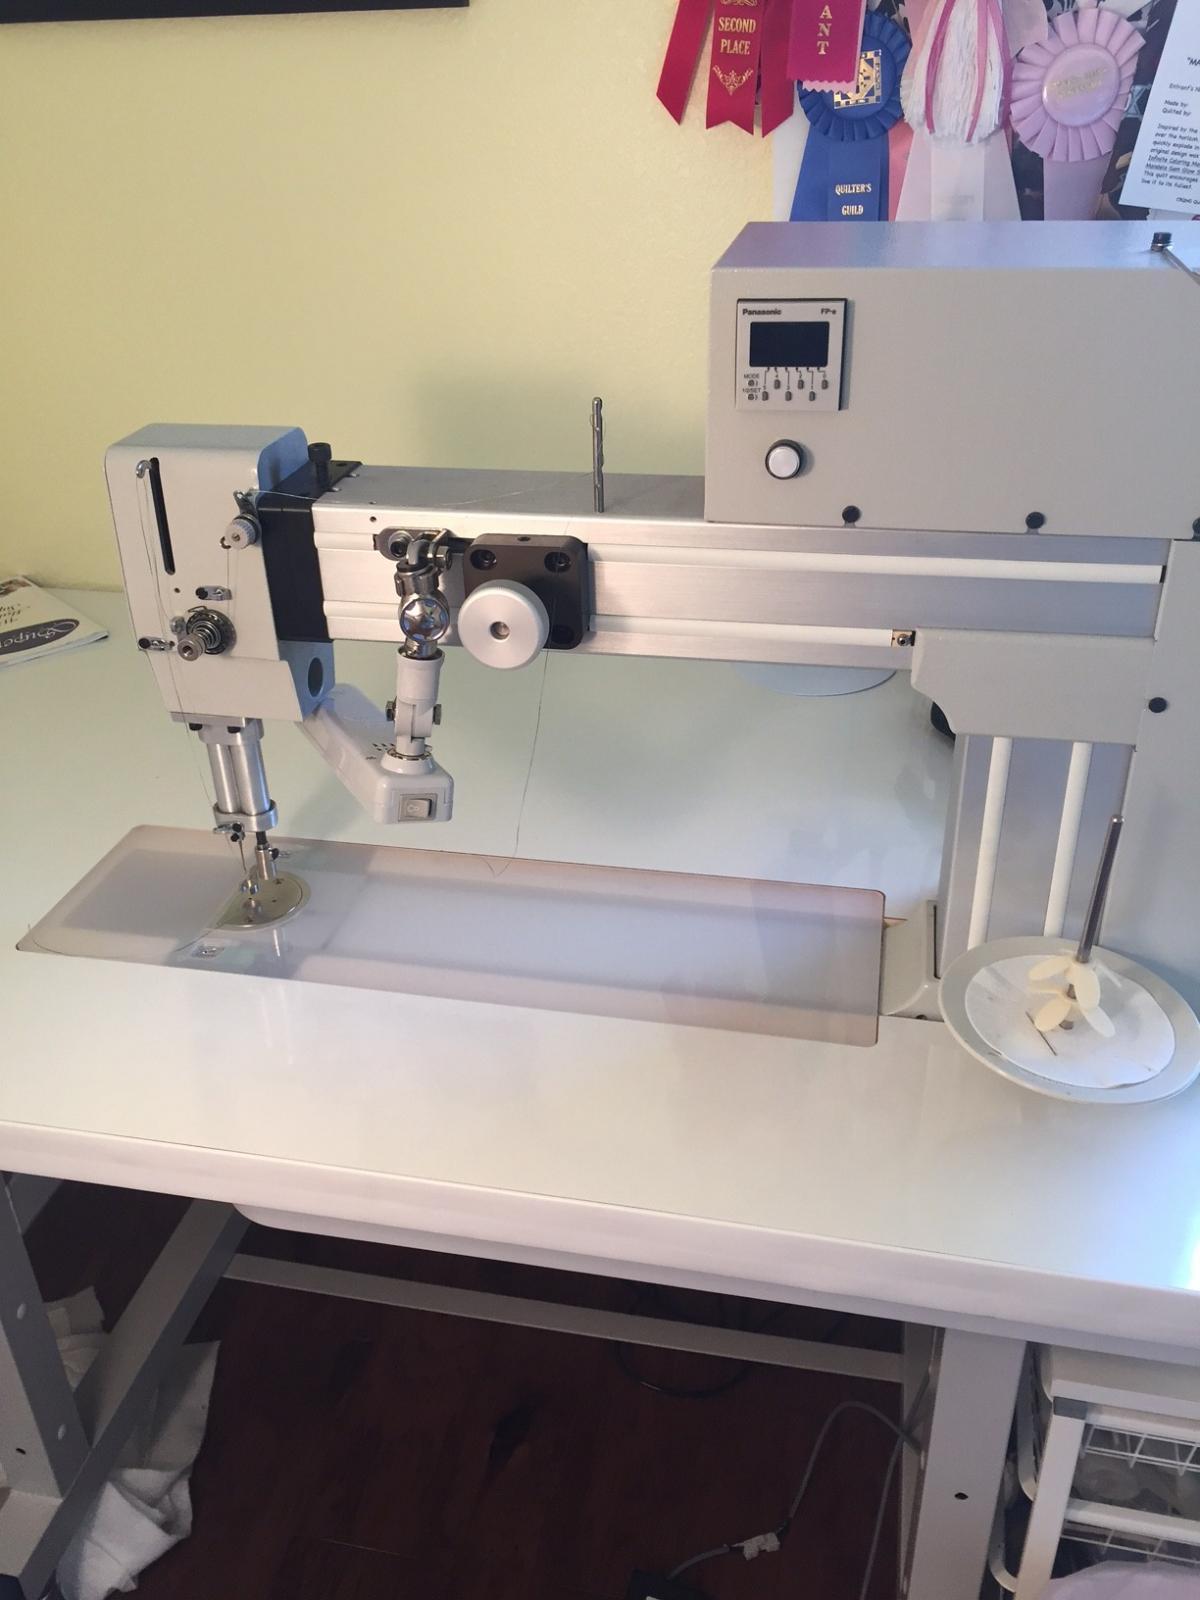 Innova sit-down w/stitch regulator $6,000 - For Sale - Used ... : used innova quilting machine - Adamdwight.com